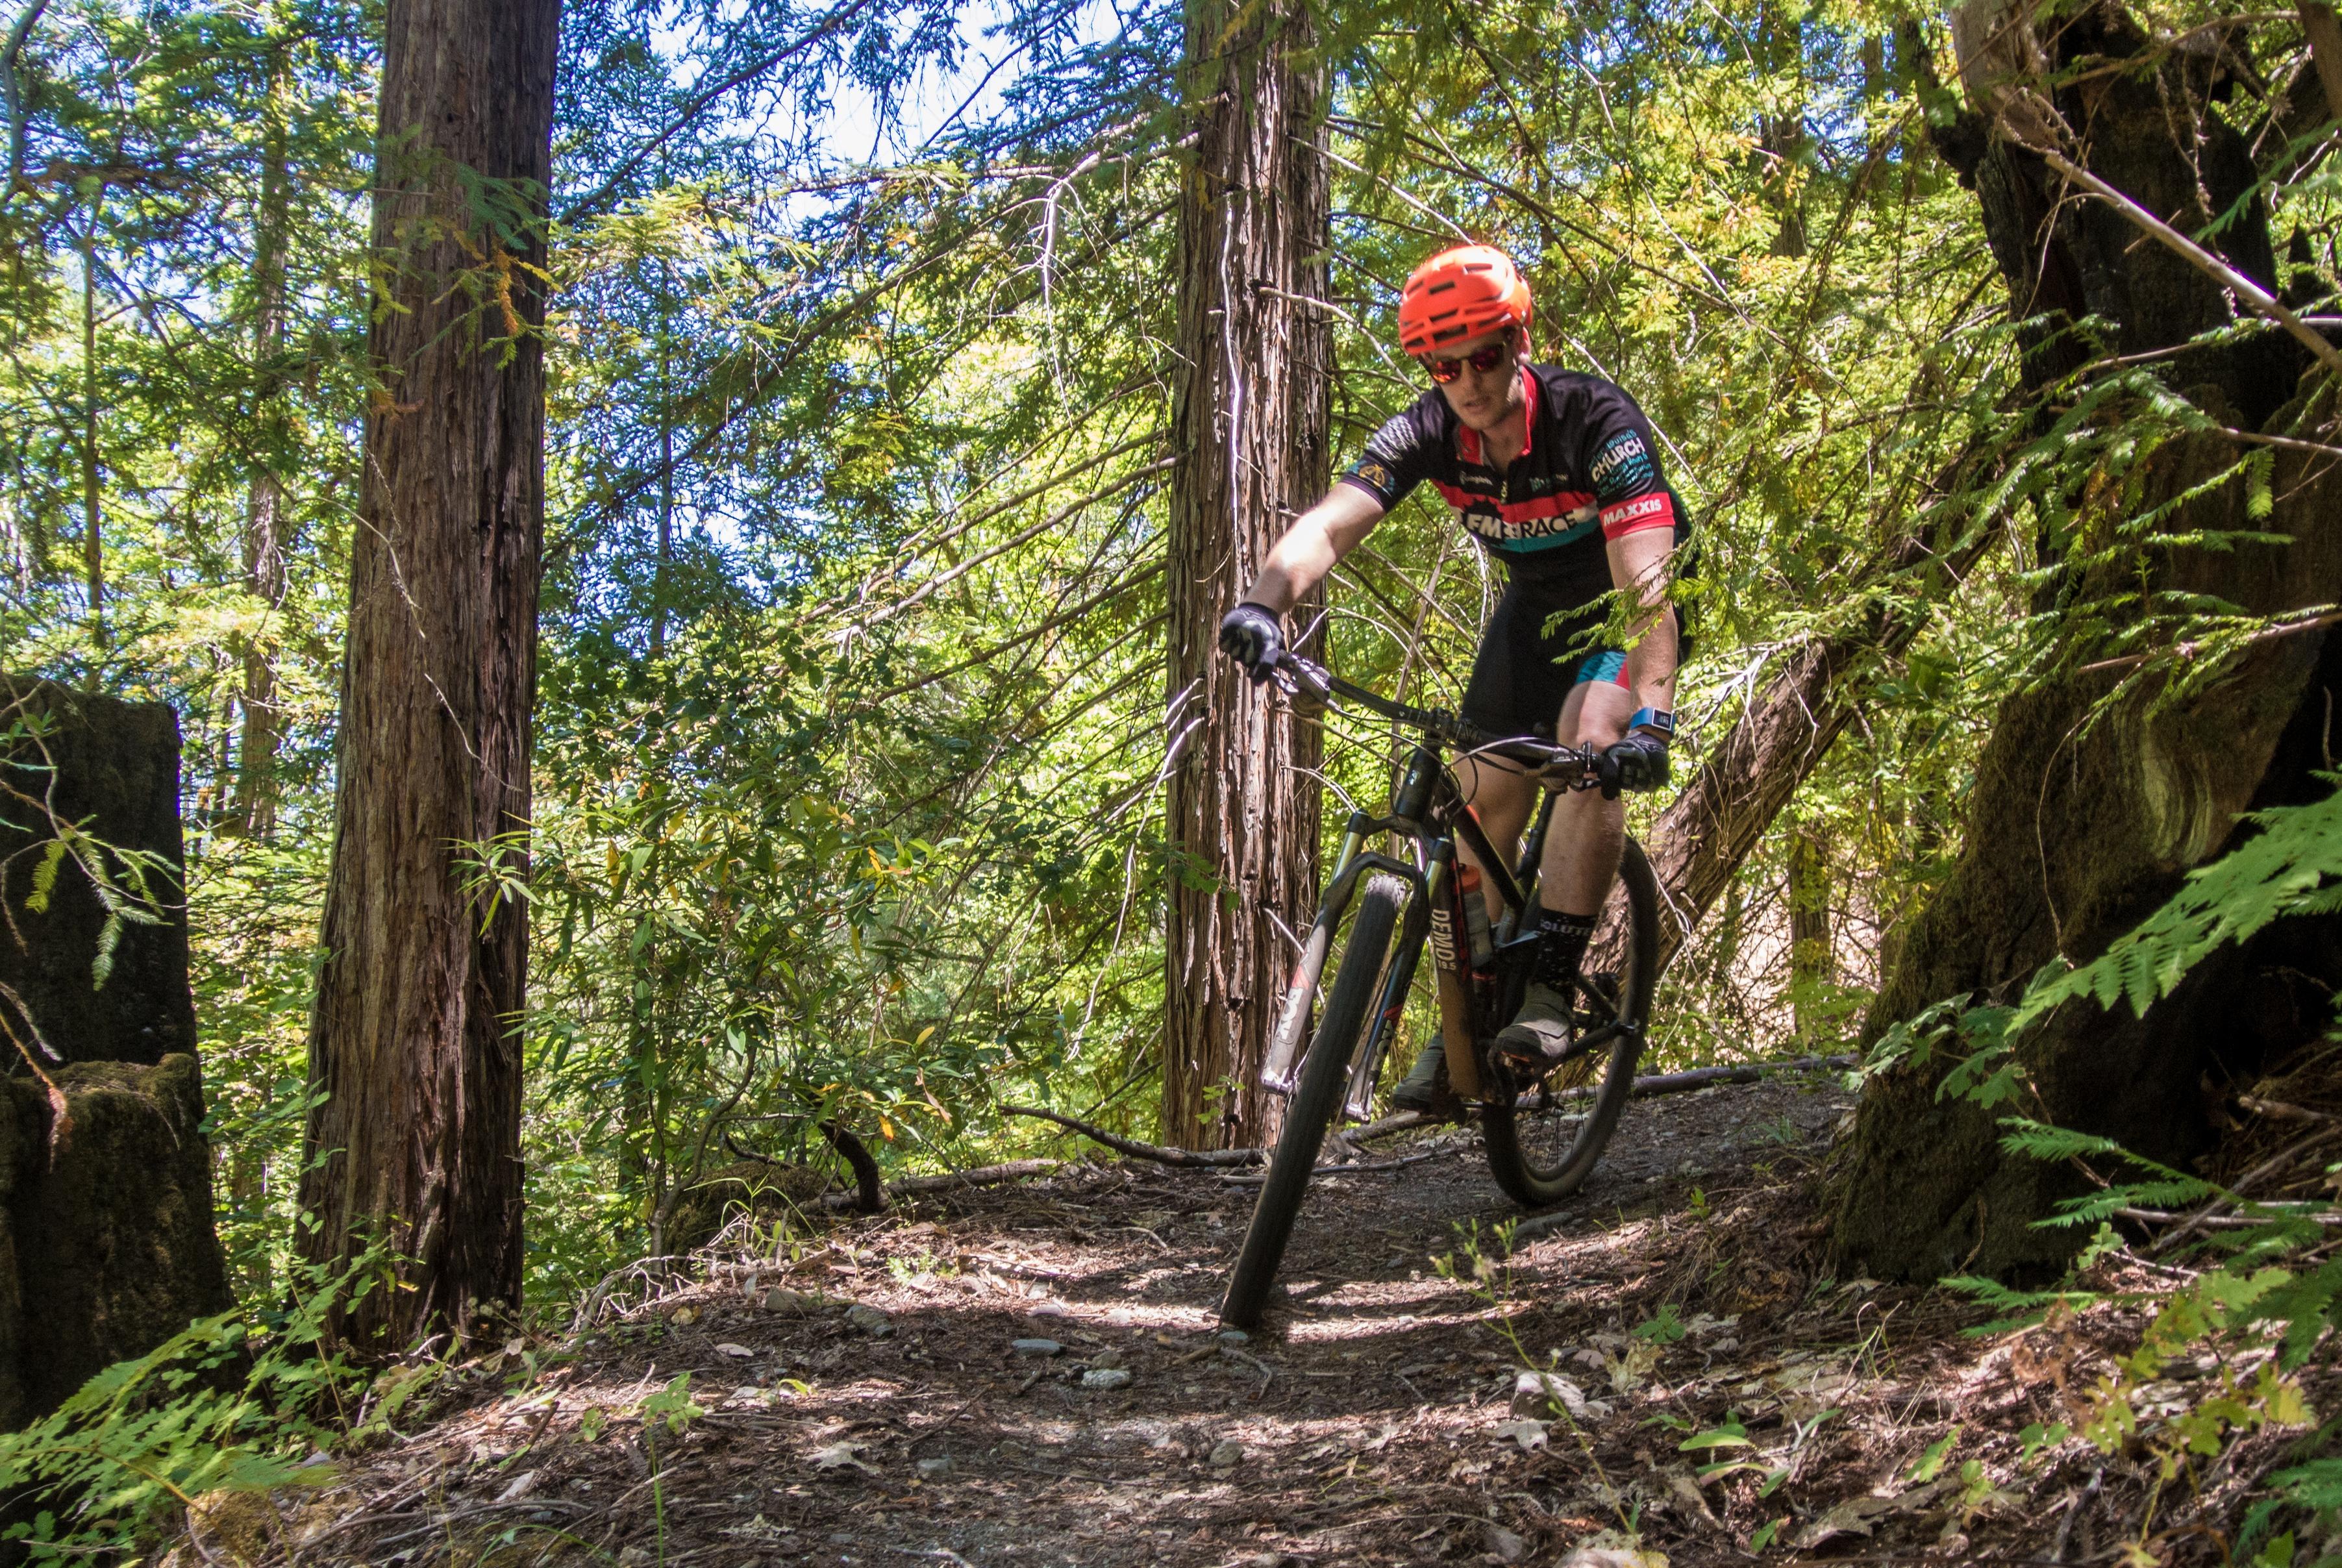 Wine Country Trails Mountain Biking In Santa Rosa